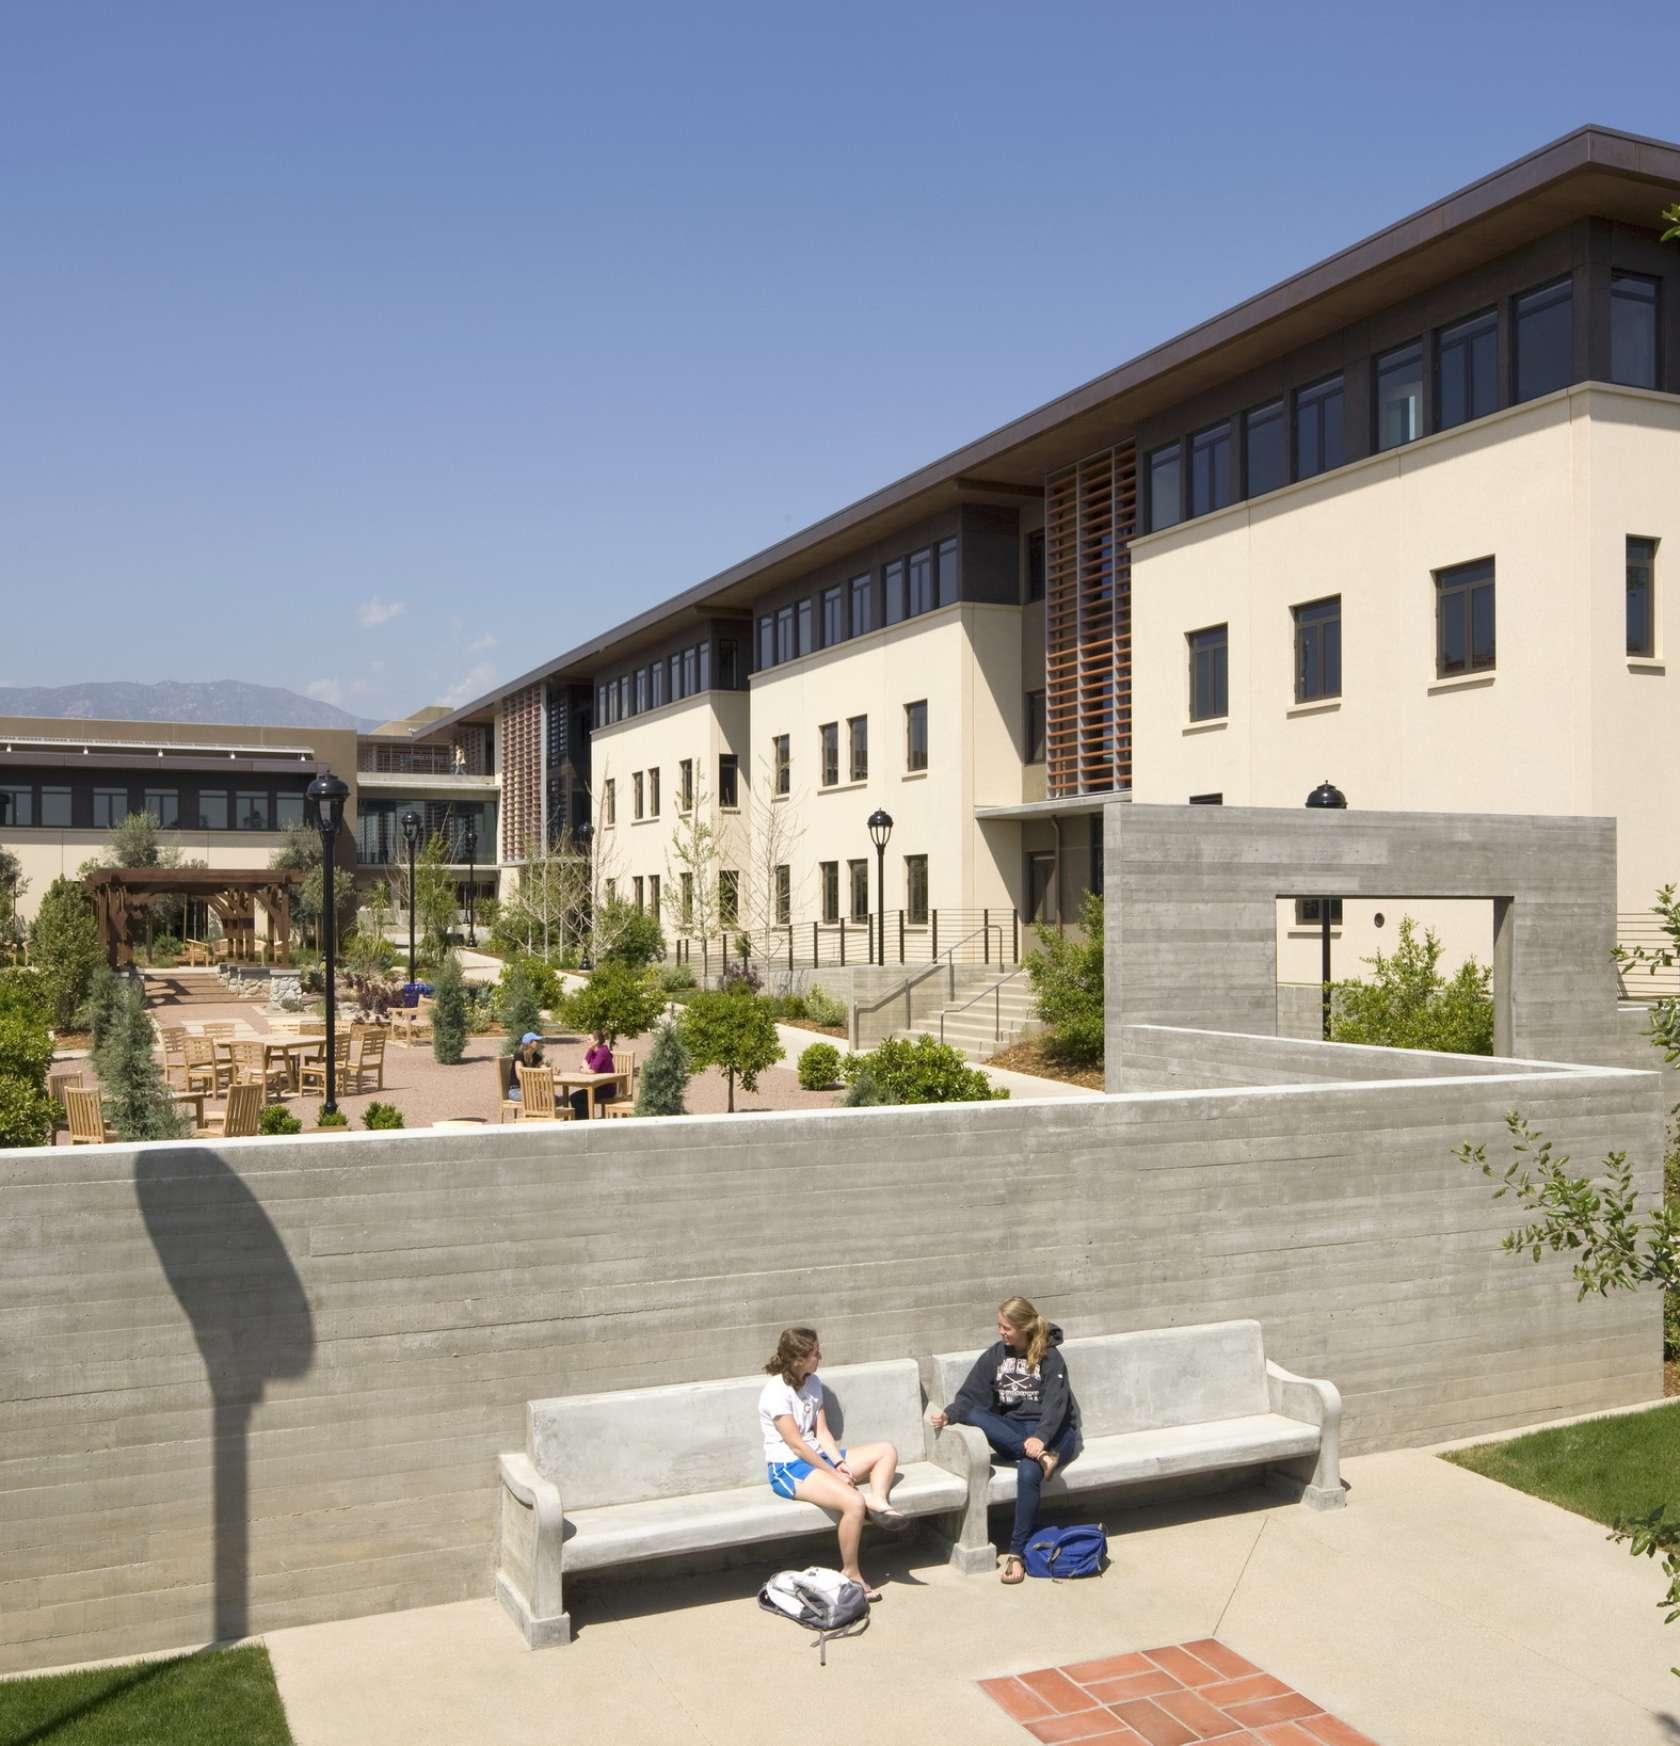 Pomona College In Claremont California Pomona College: Pomona College New Student Housing